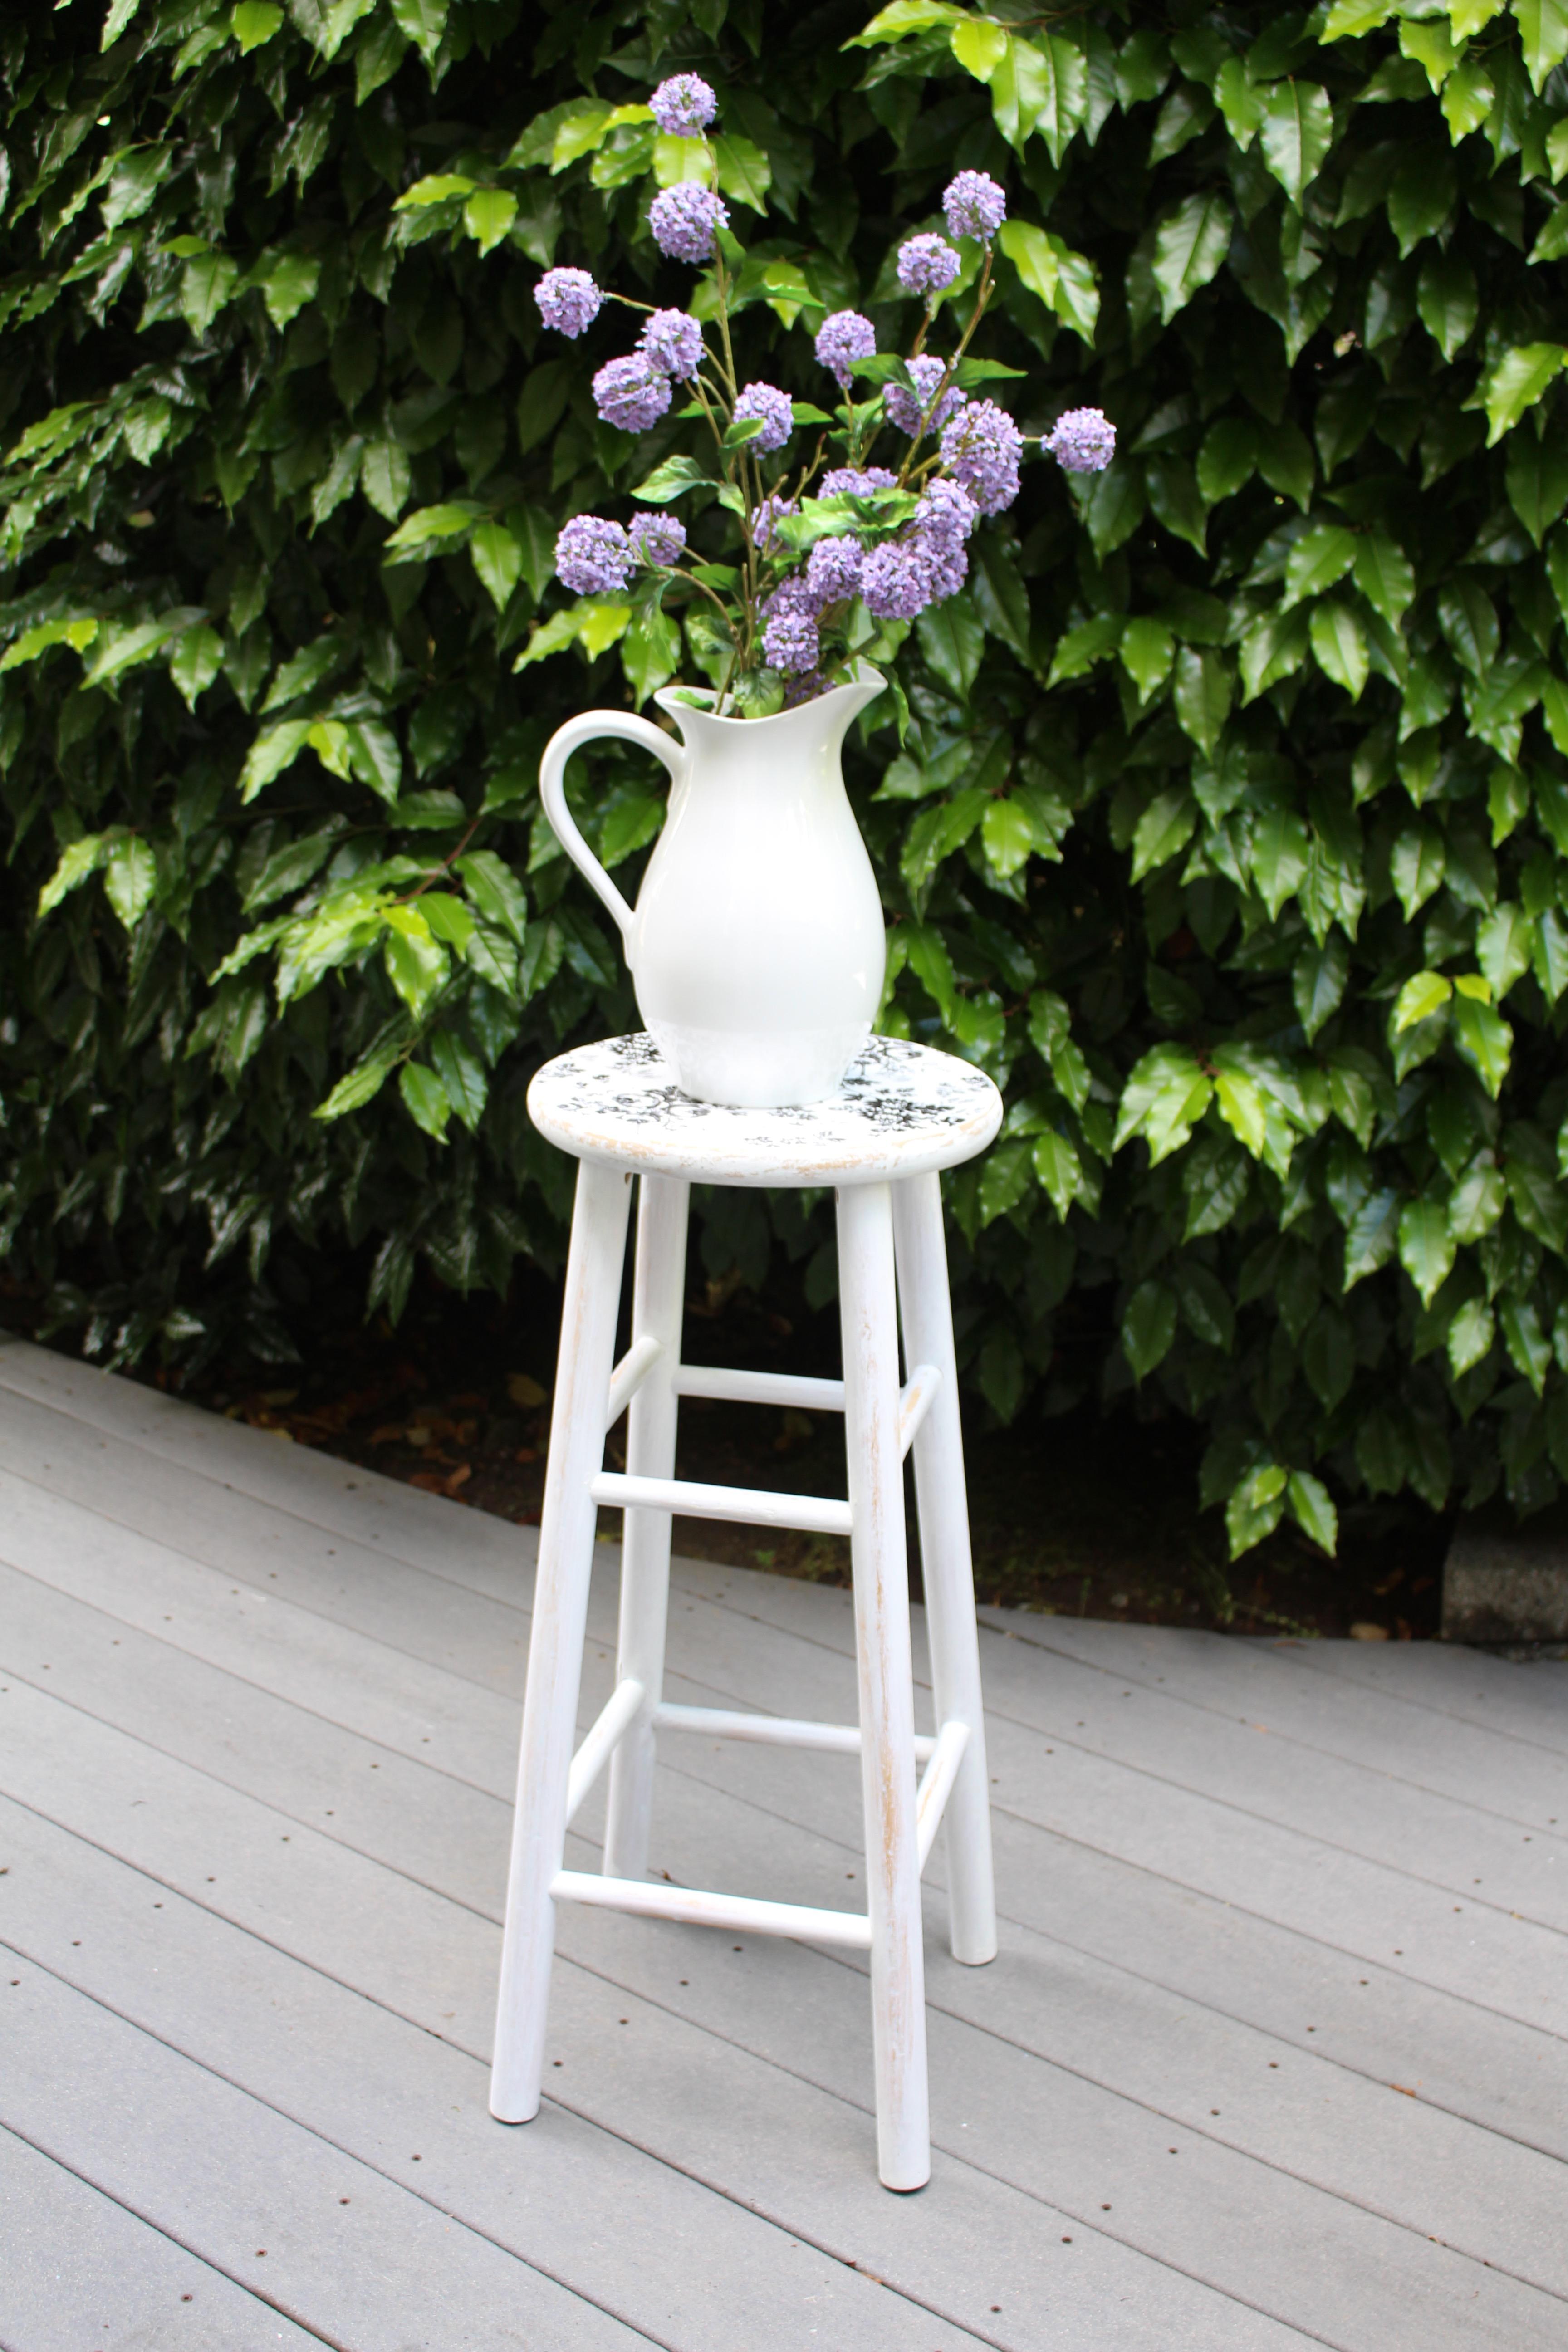 Farmhouse-Stool-with-Flowers